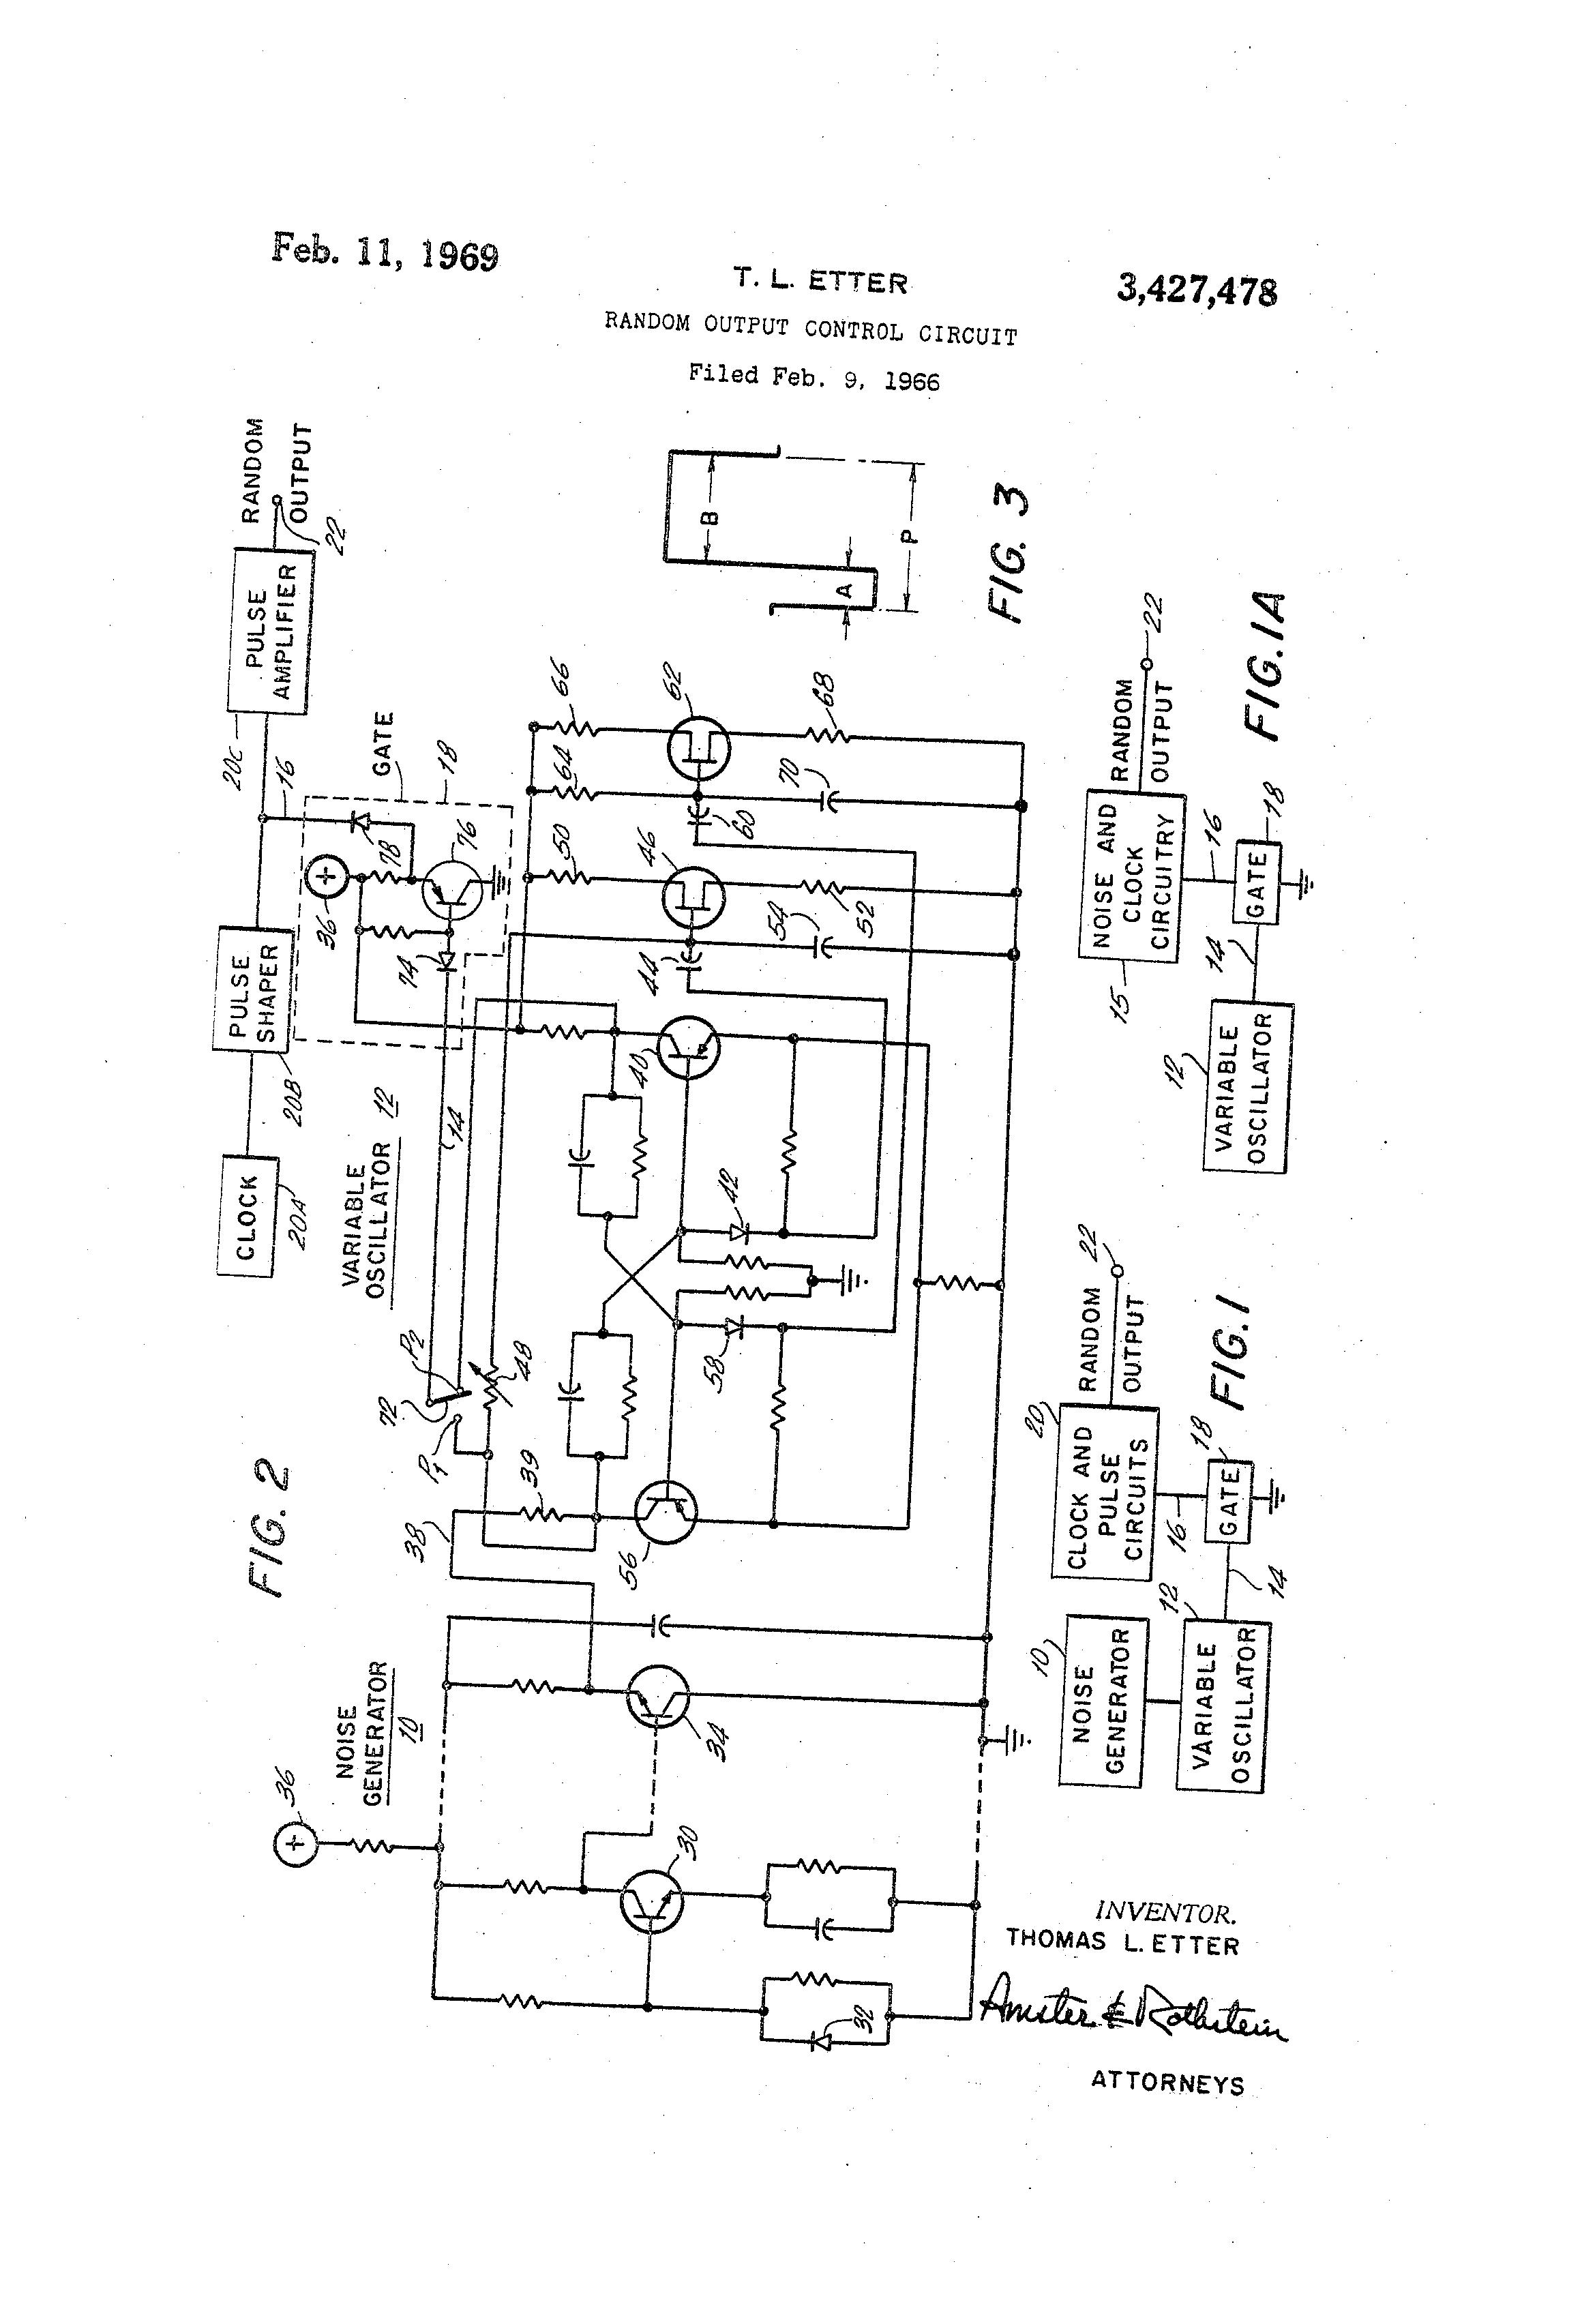 patent us3427478 - random output control circuit